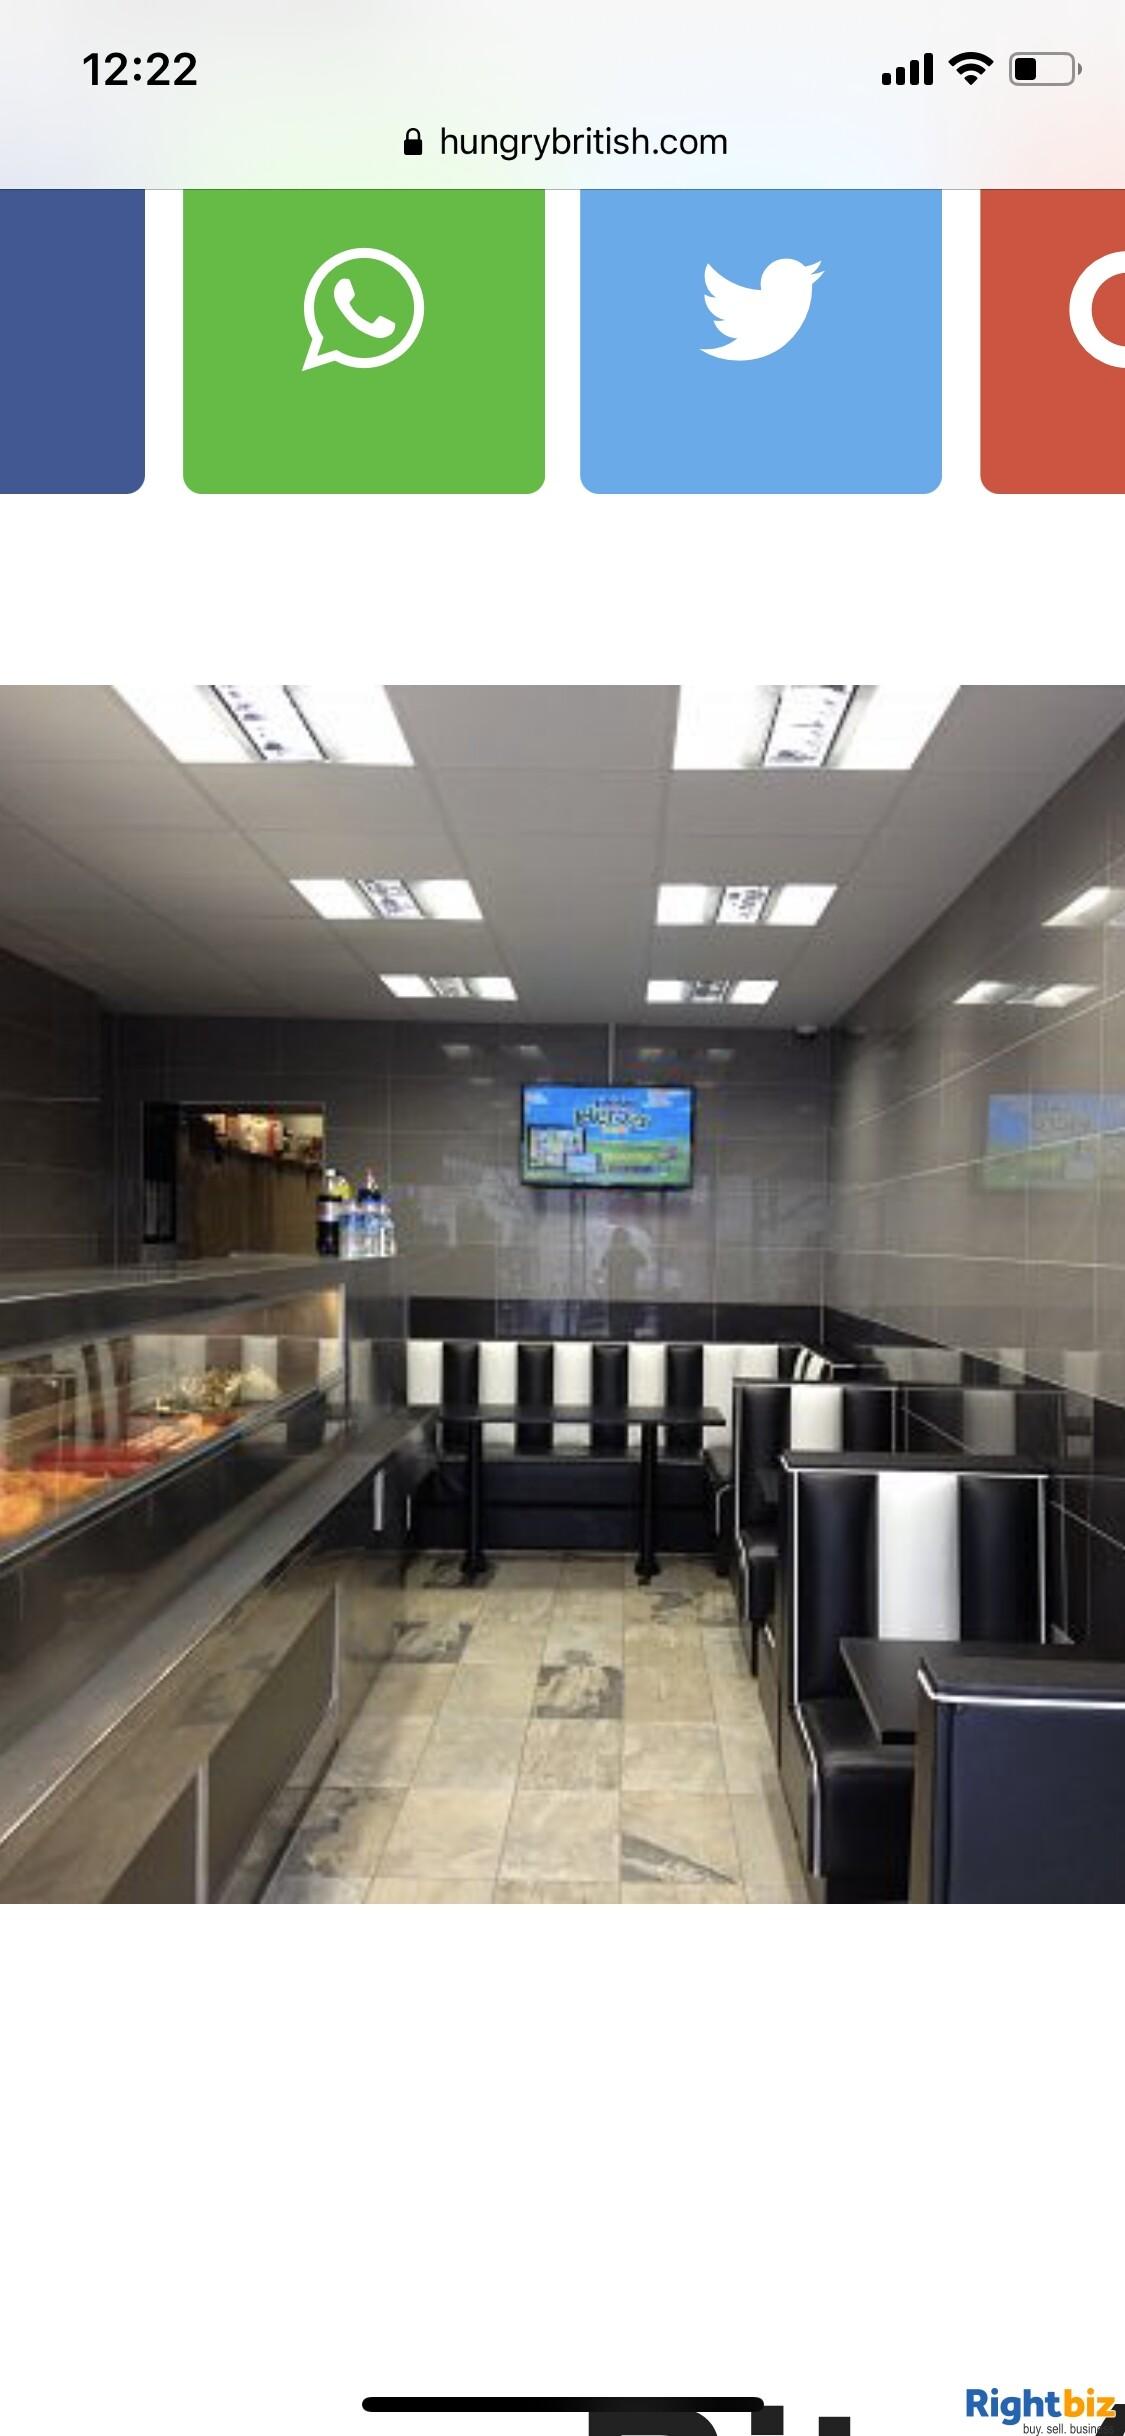 Fish & Chips shop for sale London. 3 Studio flats +1 staff room - Image 3